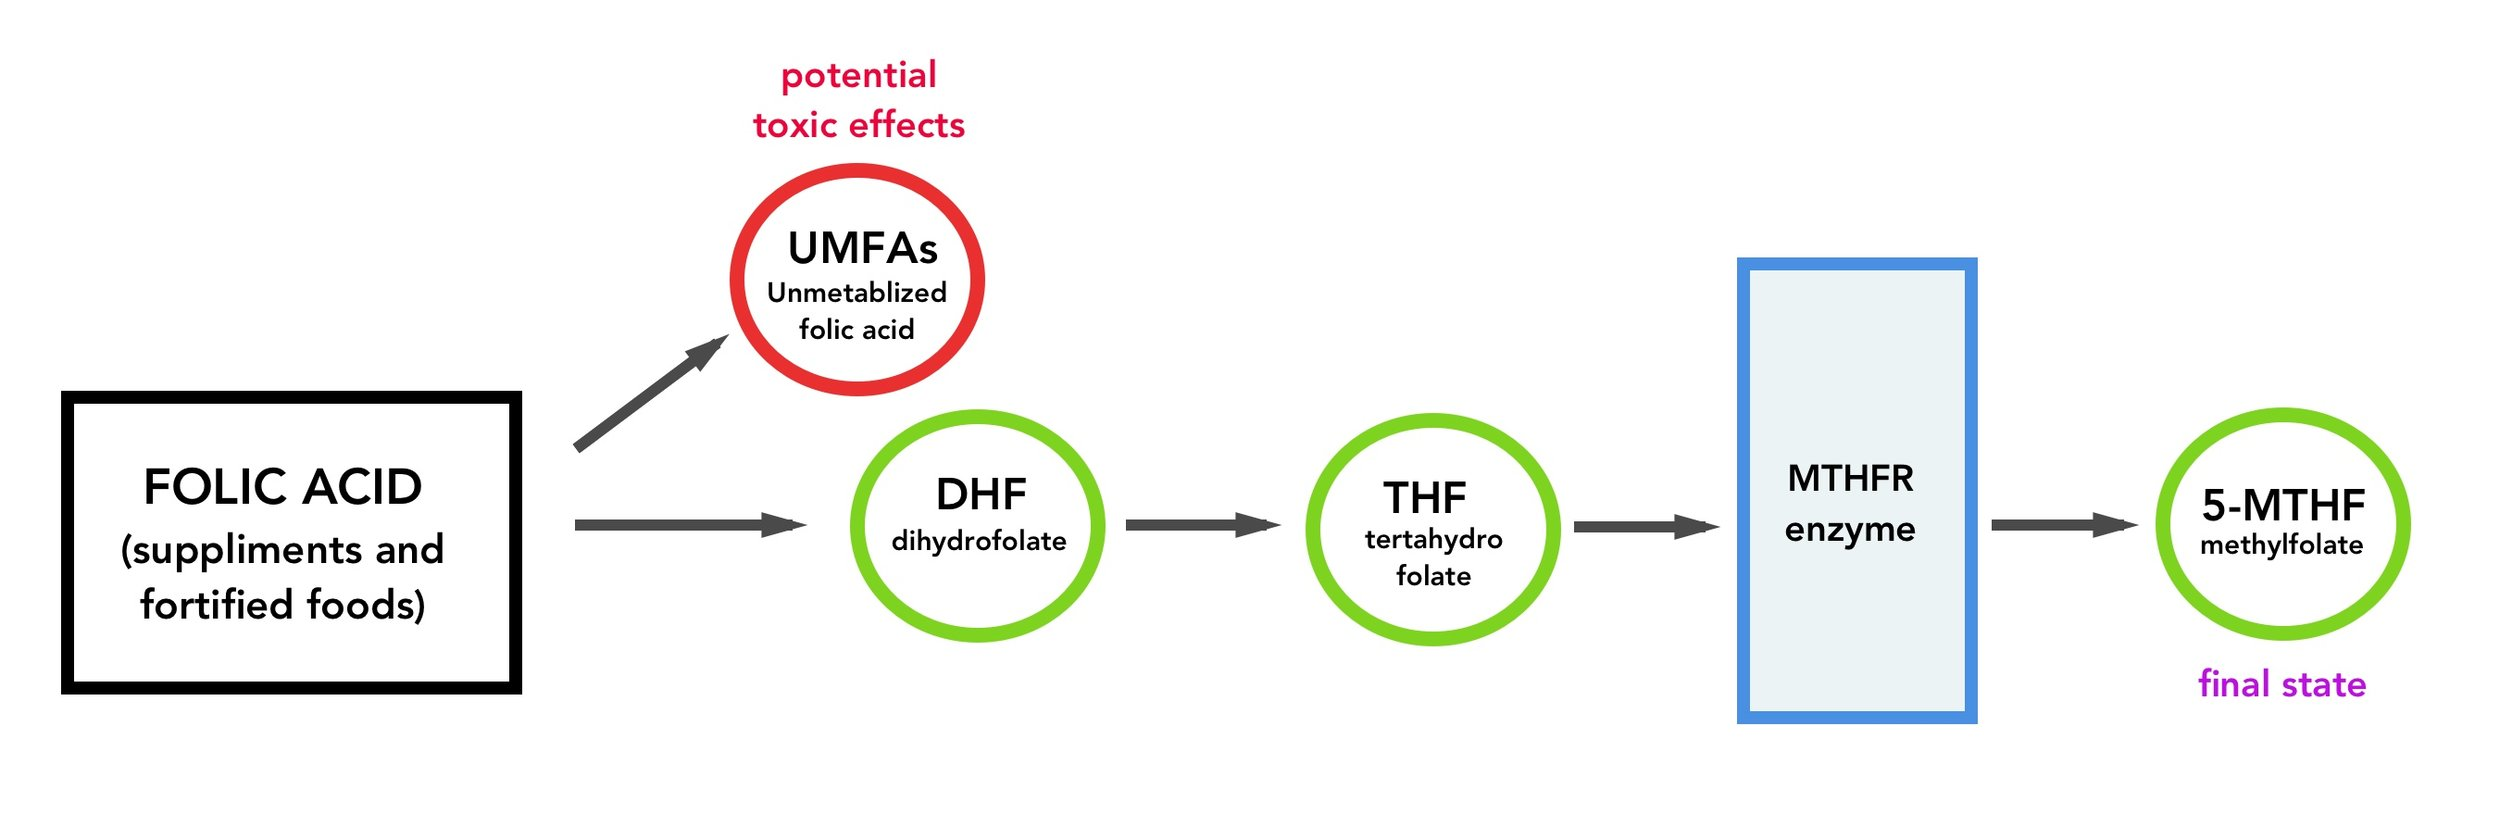 UMFAs folic acid pathway